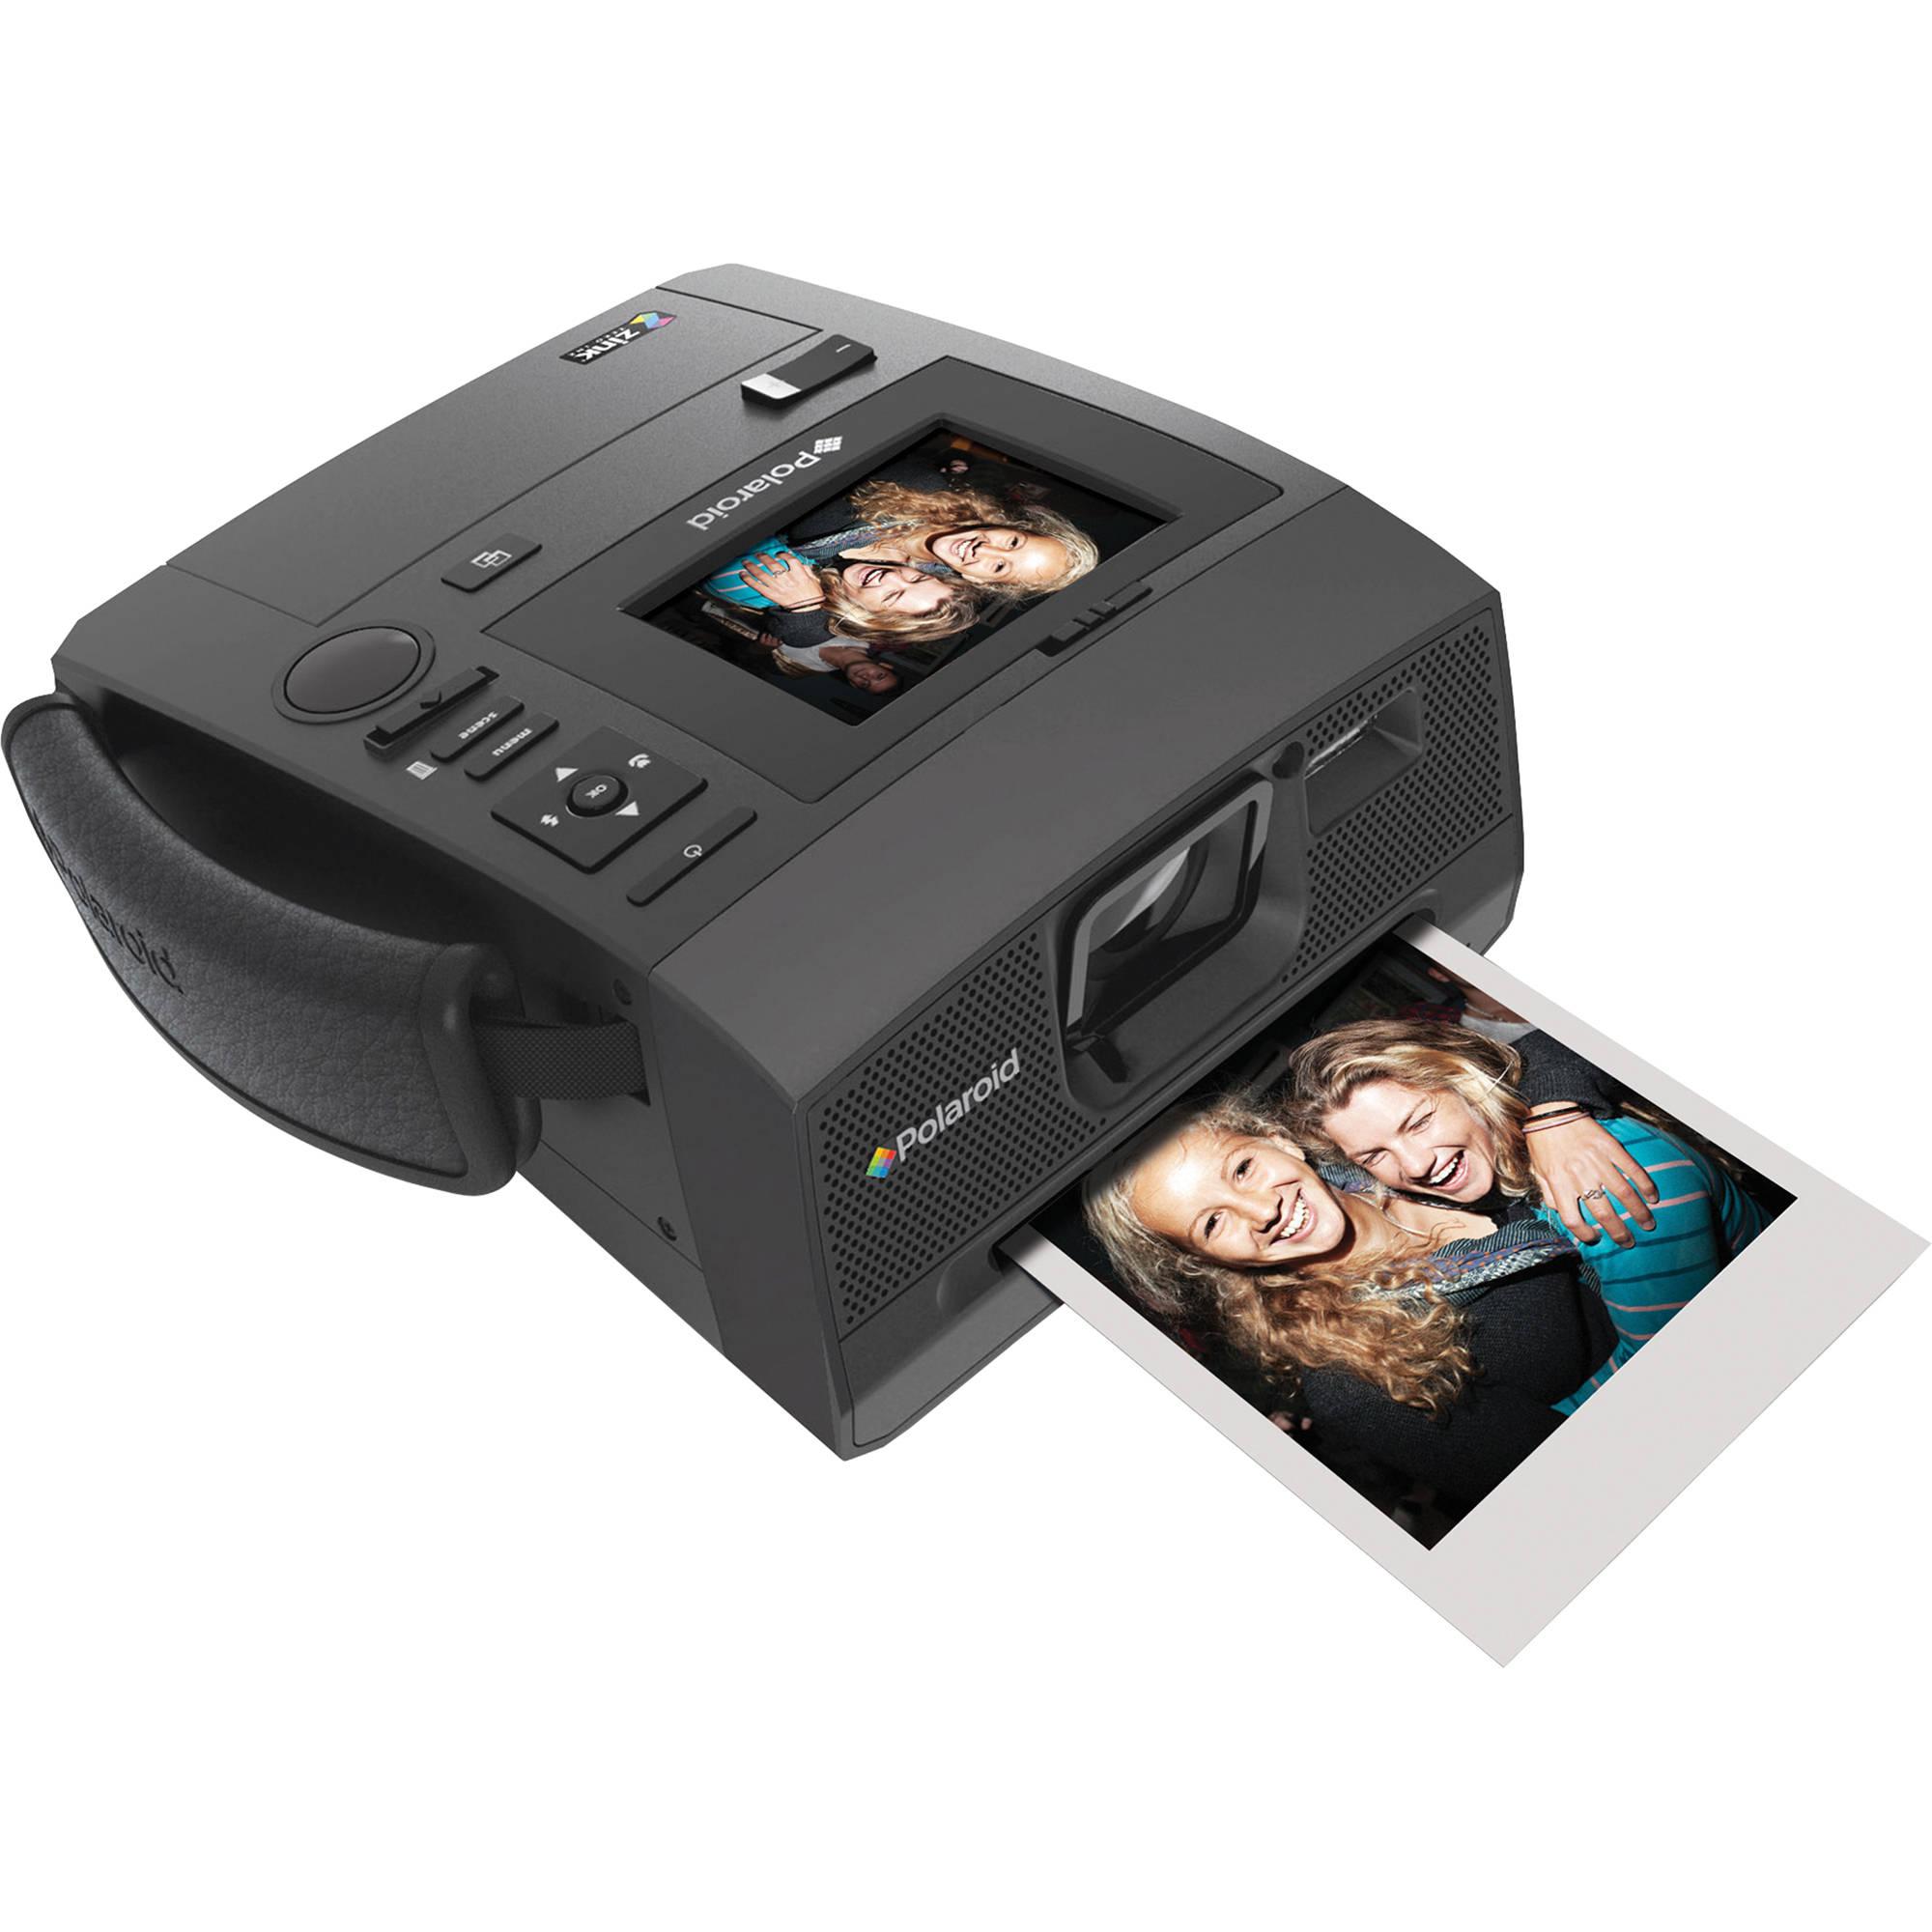 polaroid z340 instant digital camera with universal polz340uni rh bhphotovideo com Instruction Manual Book User Manual Template